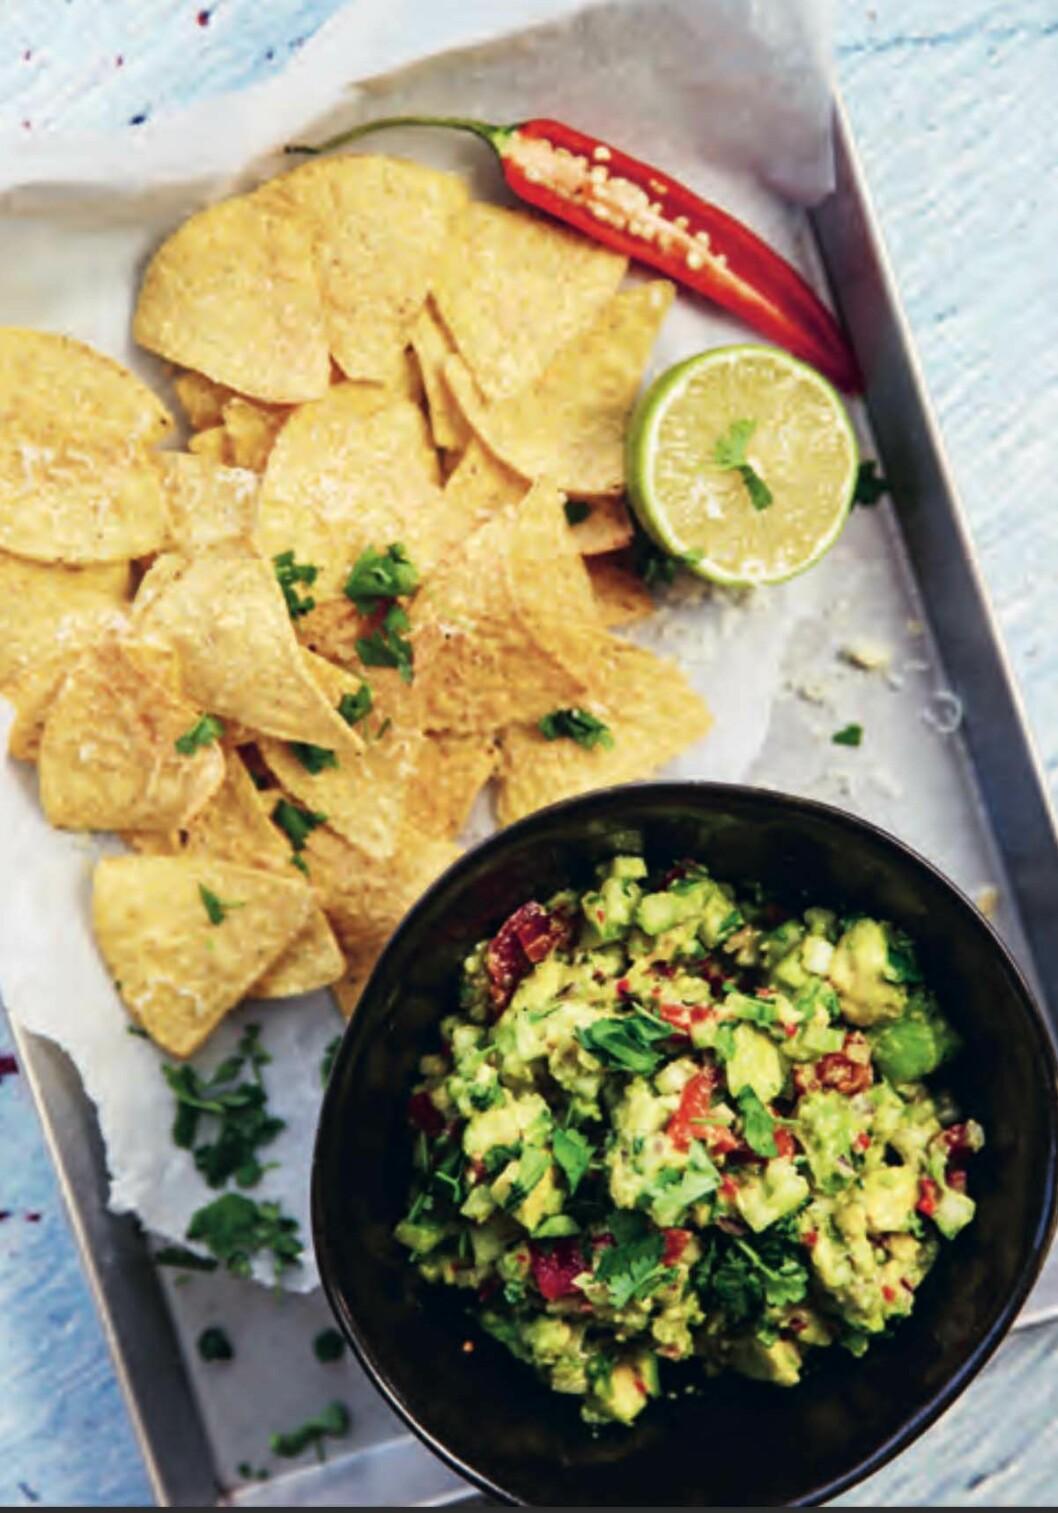 Recept på mexican chunky guacamole med gruyéregratinerade nachos.